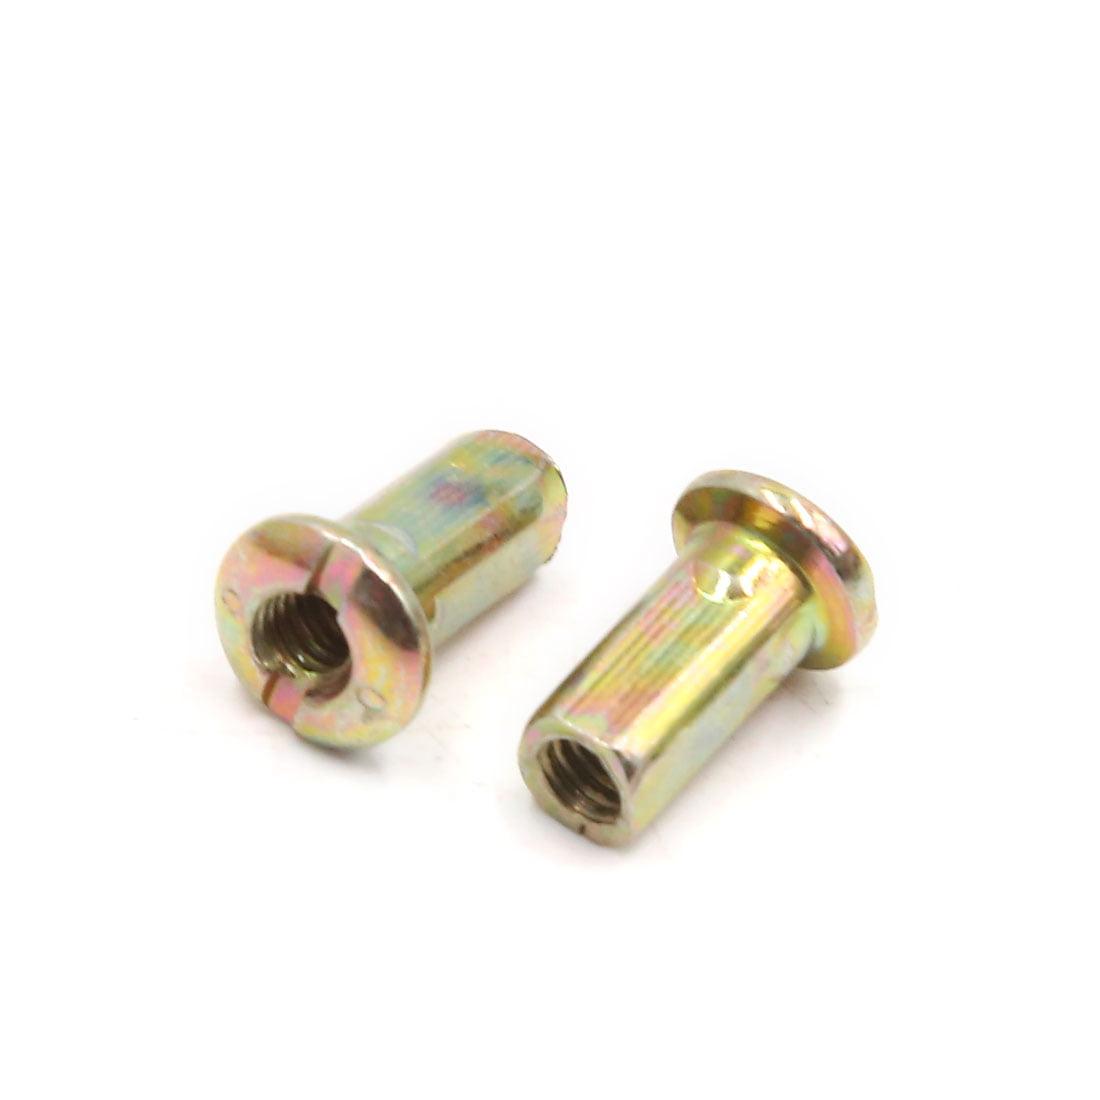 72pcs 4mm Thread Diameter Motorcycle Wheel Spokes w/ Nipples 165mm Length - image 2 of 3